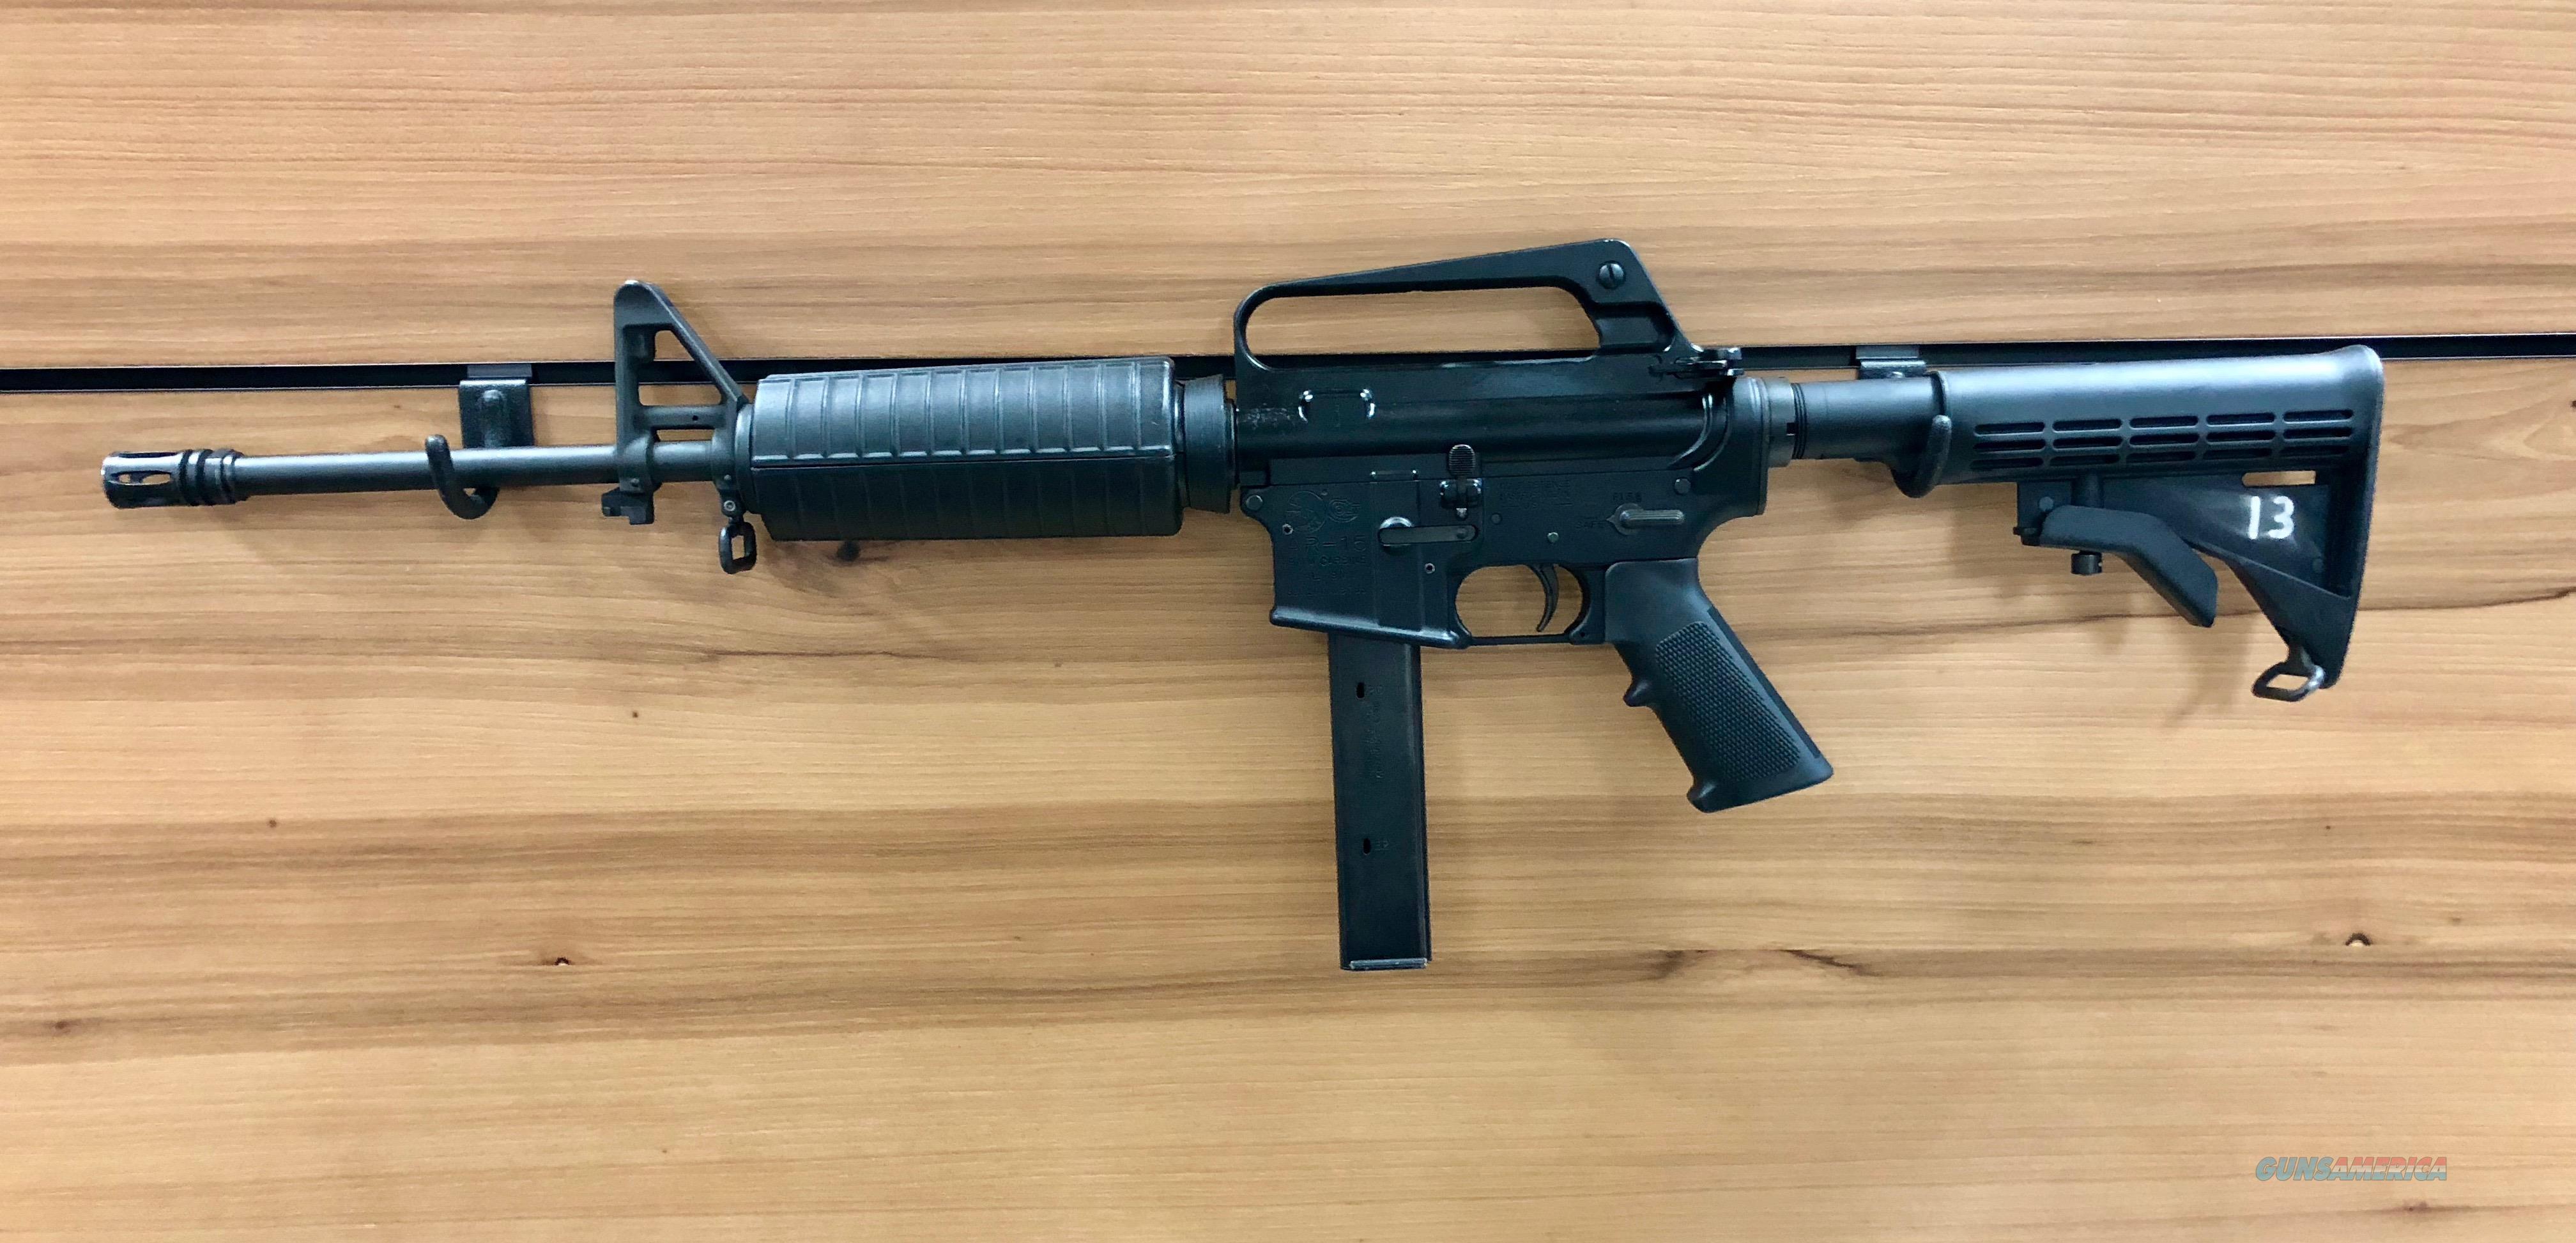 USED COLT AR6450 AR-15, 9MM CARBINE  Guns > Rifles > Colt Military/Tactical Rifles